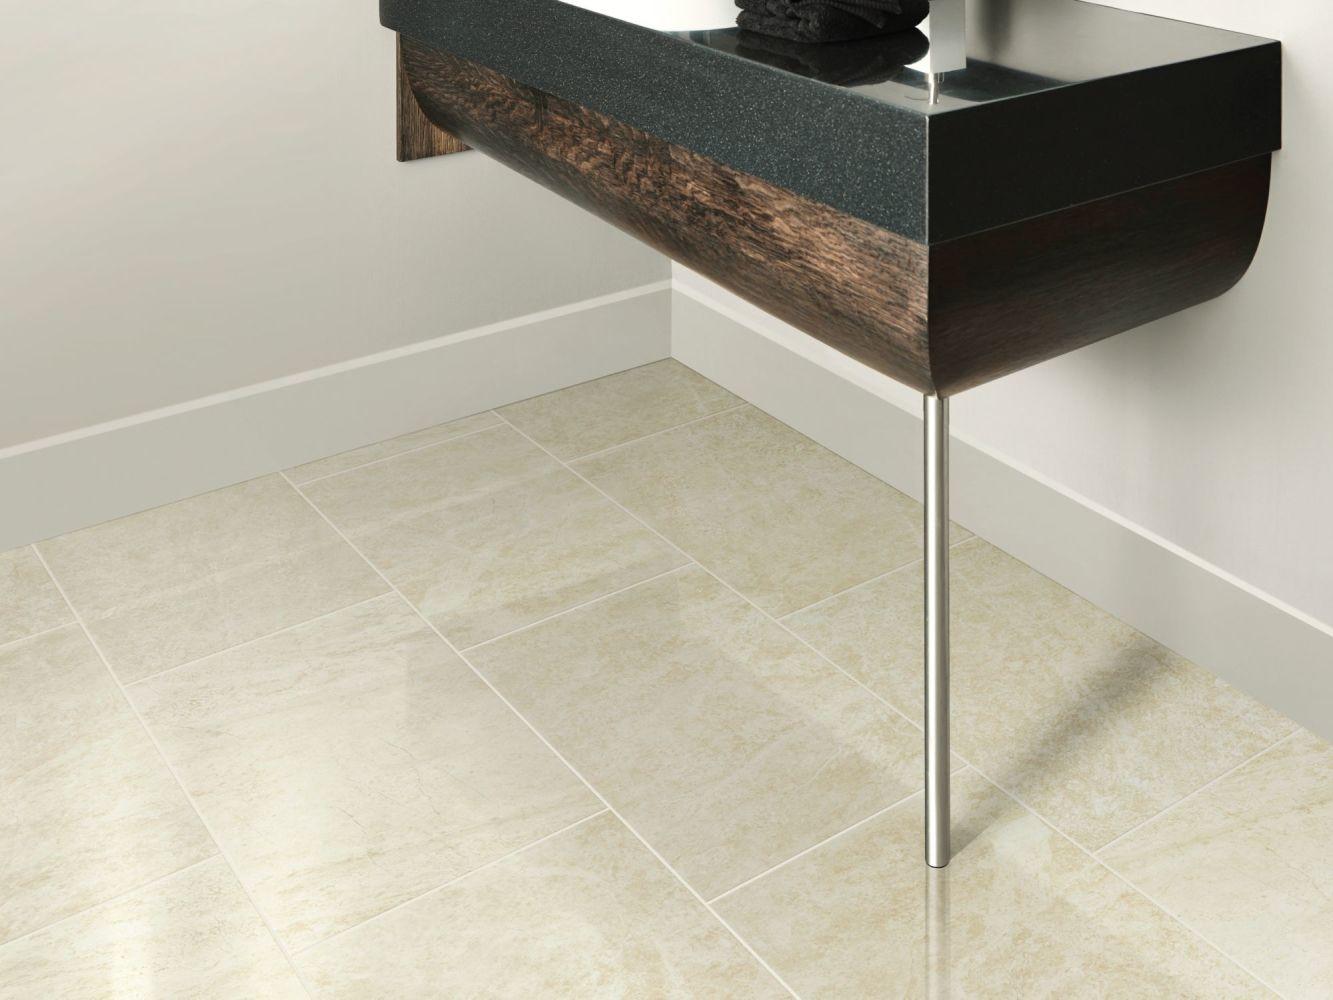 Shaw Floors Home Fn Gold Ceramic Marvel 12×24 Polish Allure 00200_TG10C